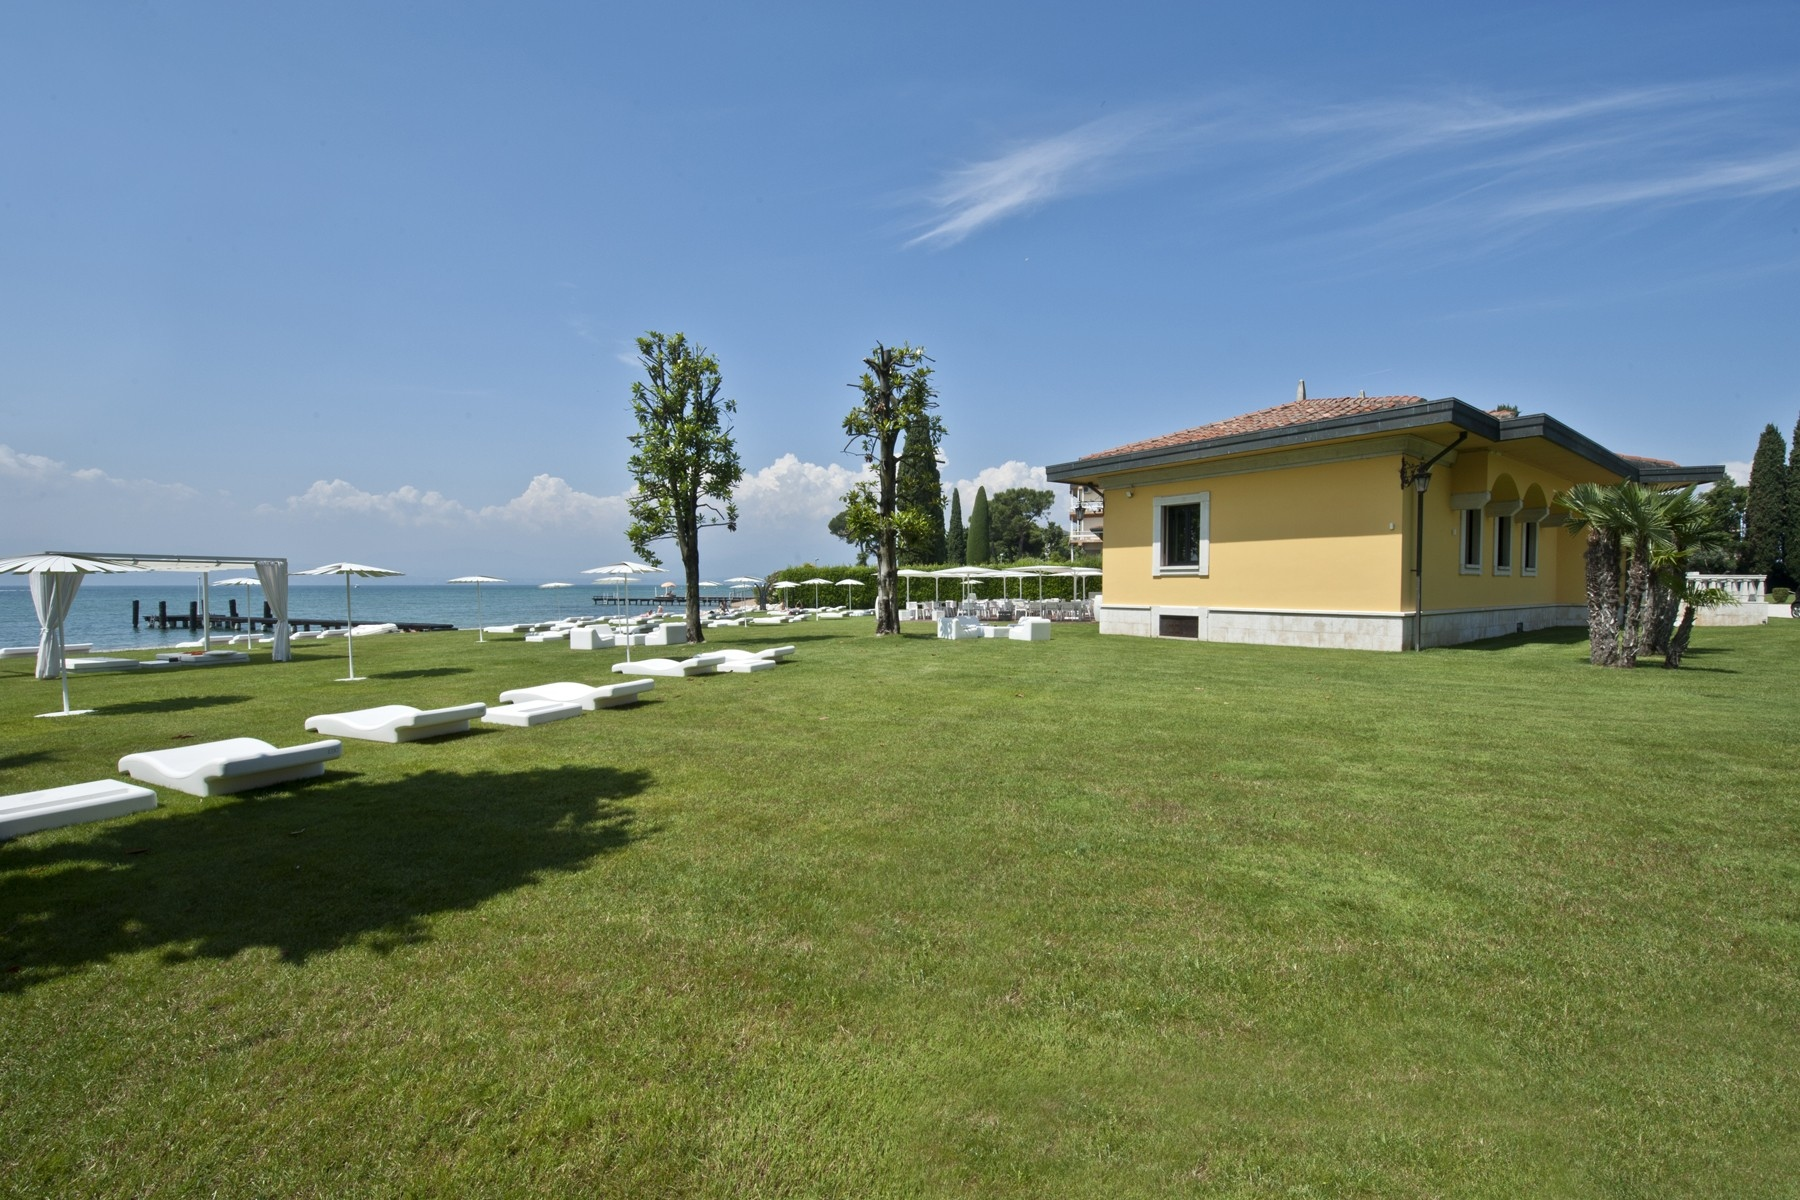 Villa in Vendita a Sirmione: 5 locali, 550 mq - Foto 7